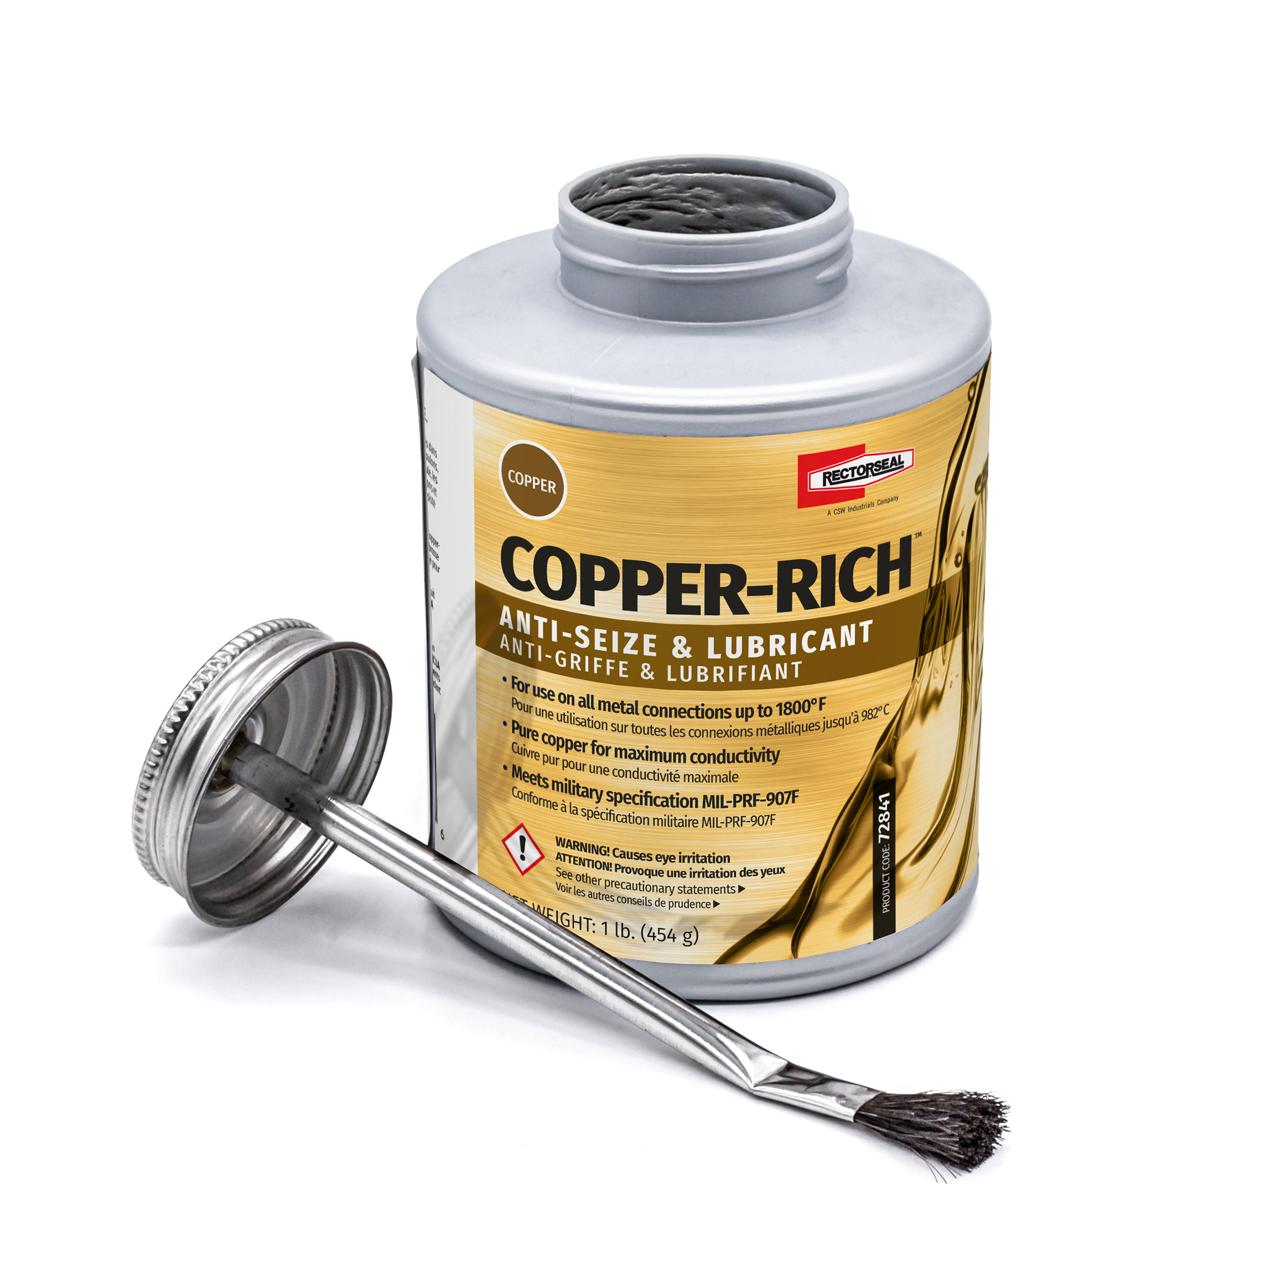 Copper-Rich